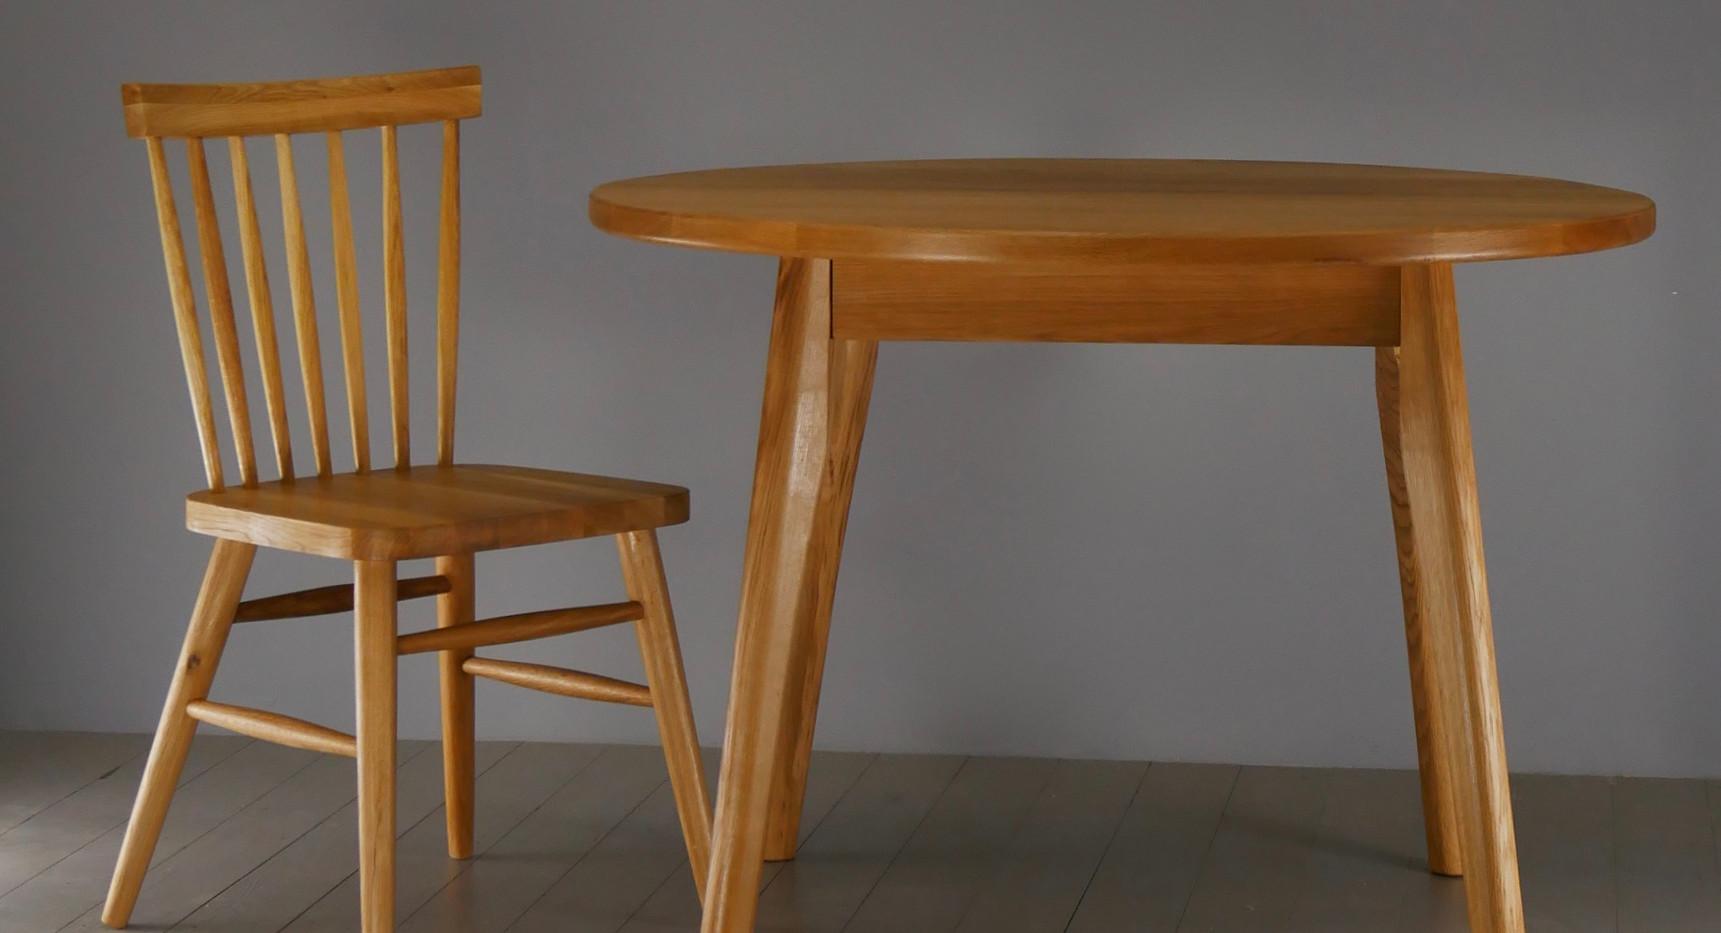 HX Solid Oak Chair